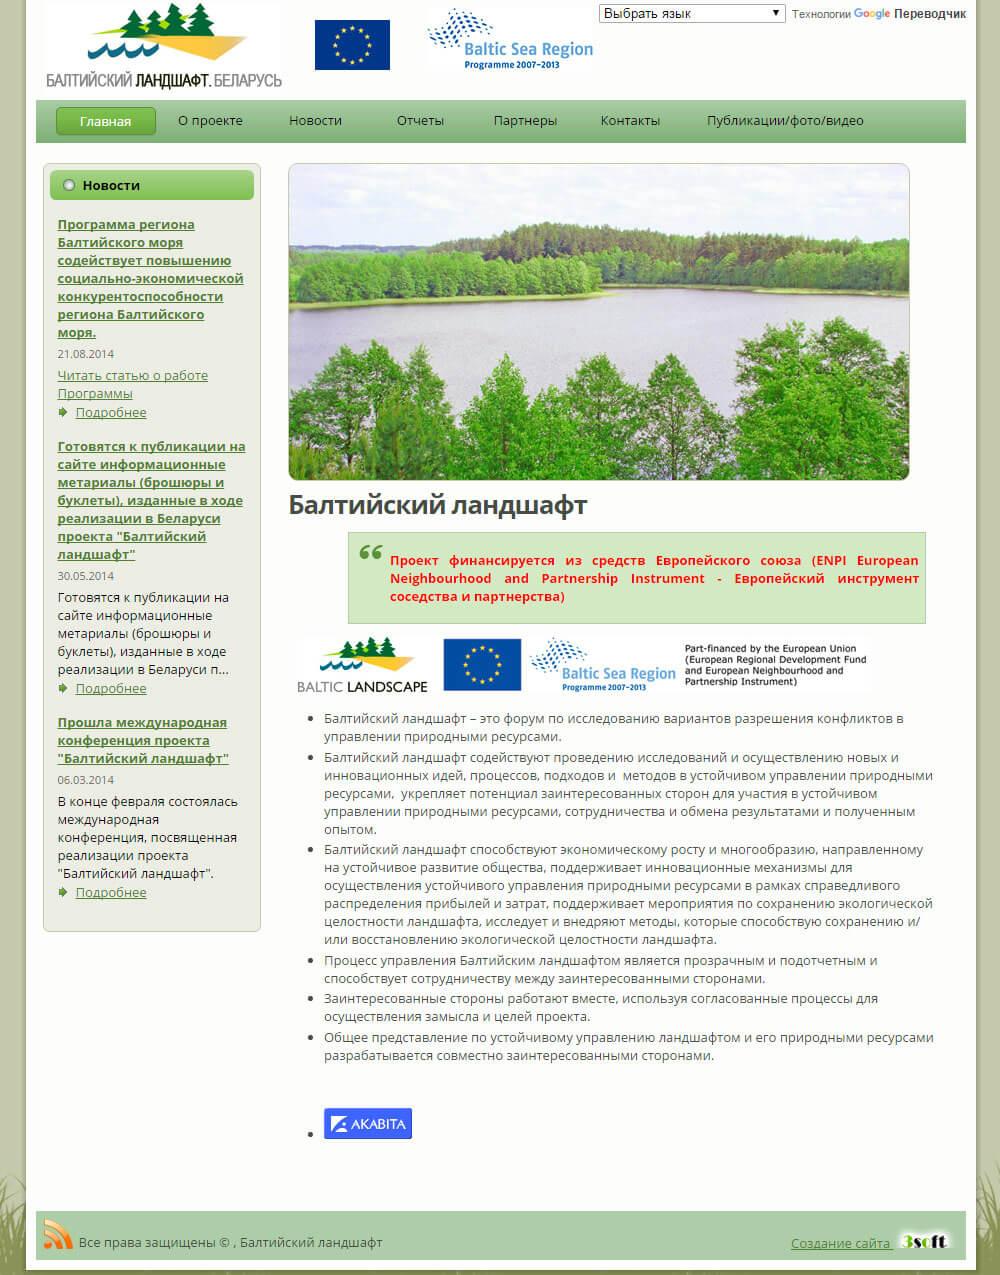 Сайт проекта «Балтийский ландшафт. Беларусь». Главная страница